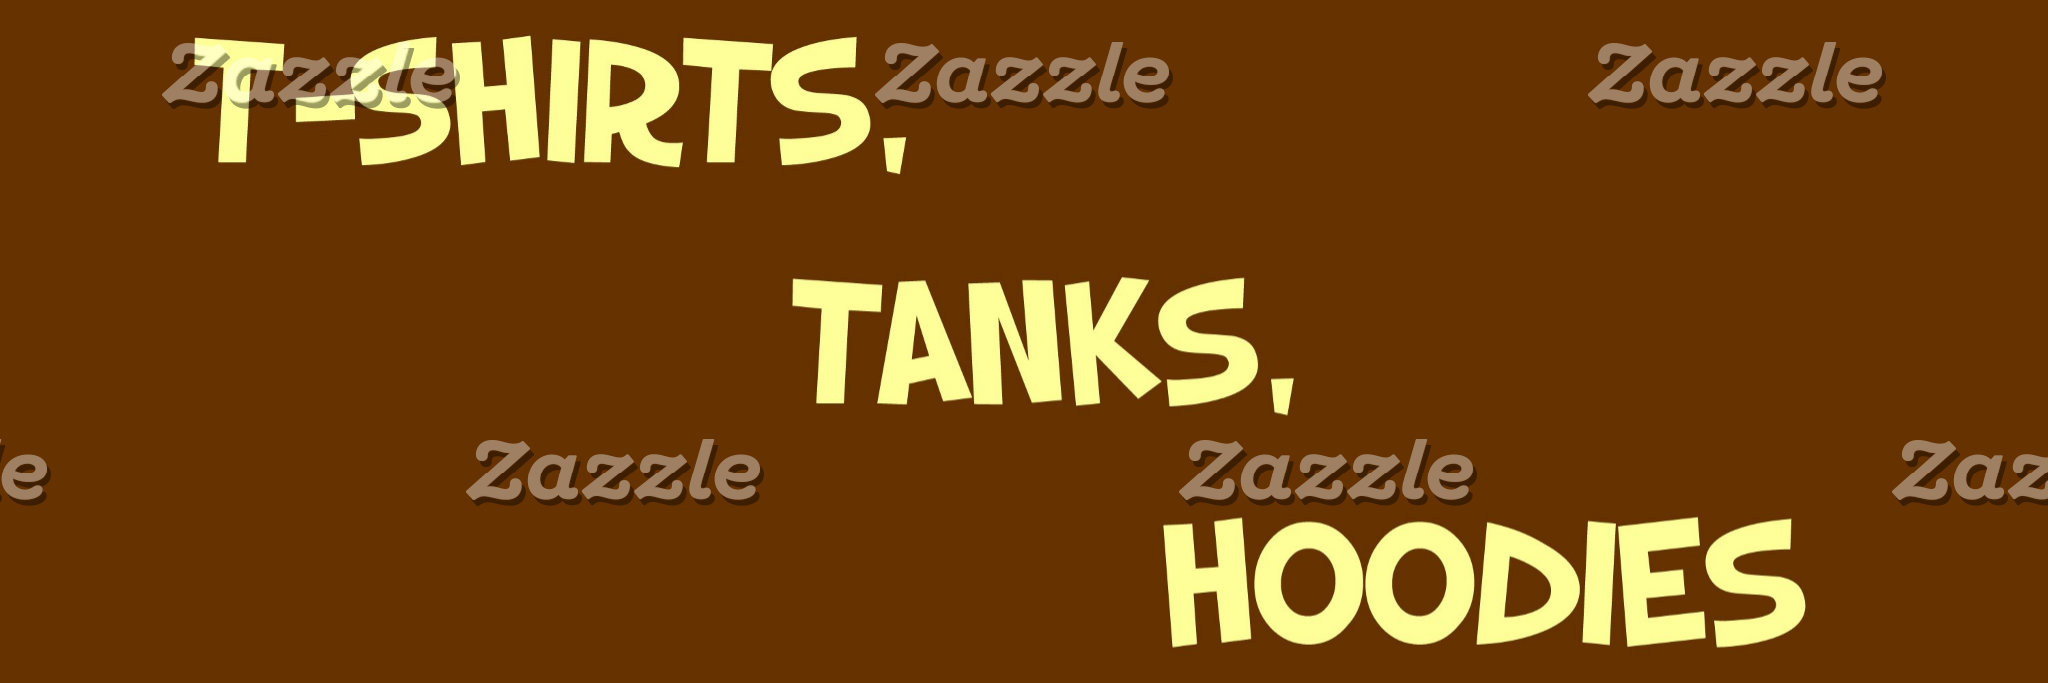 T-SHIRTS, TANKS, HOODIES